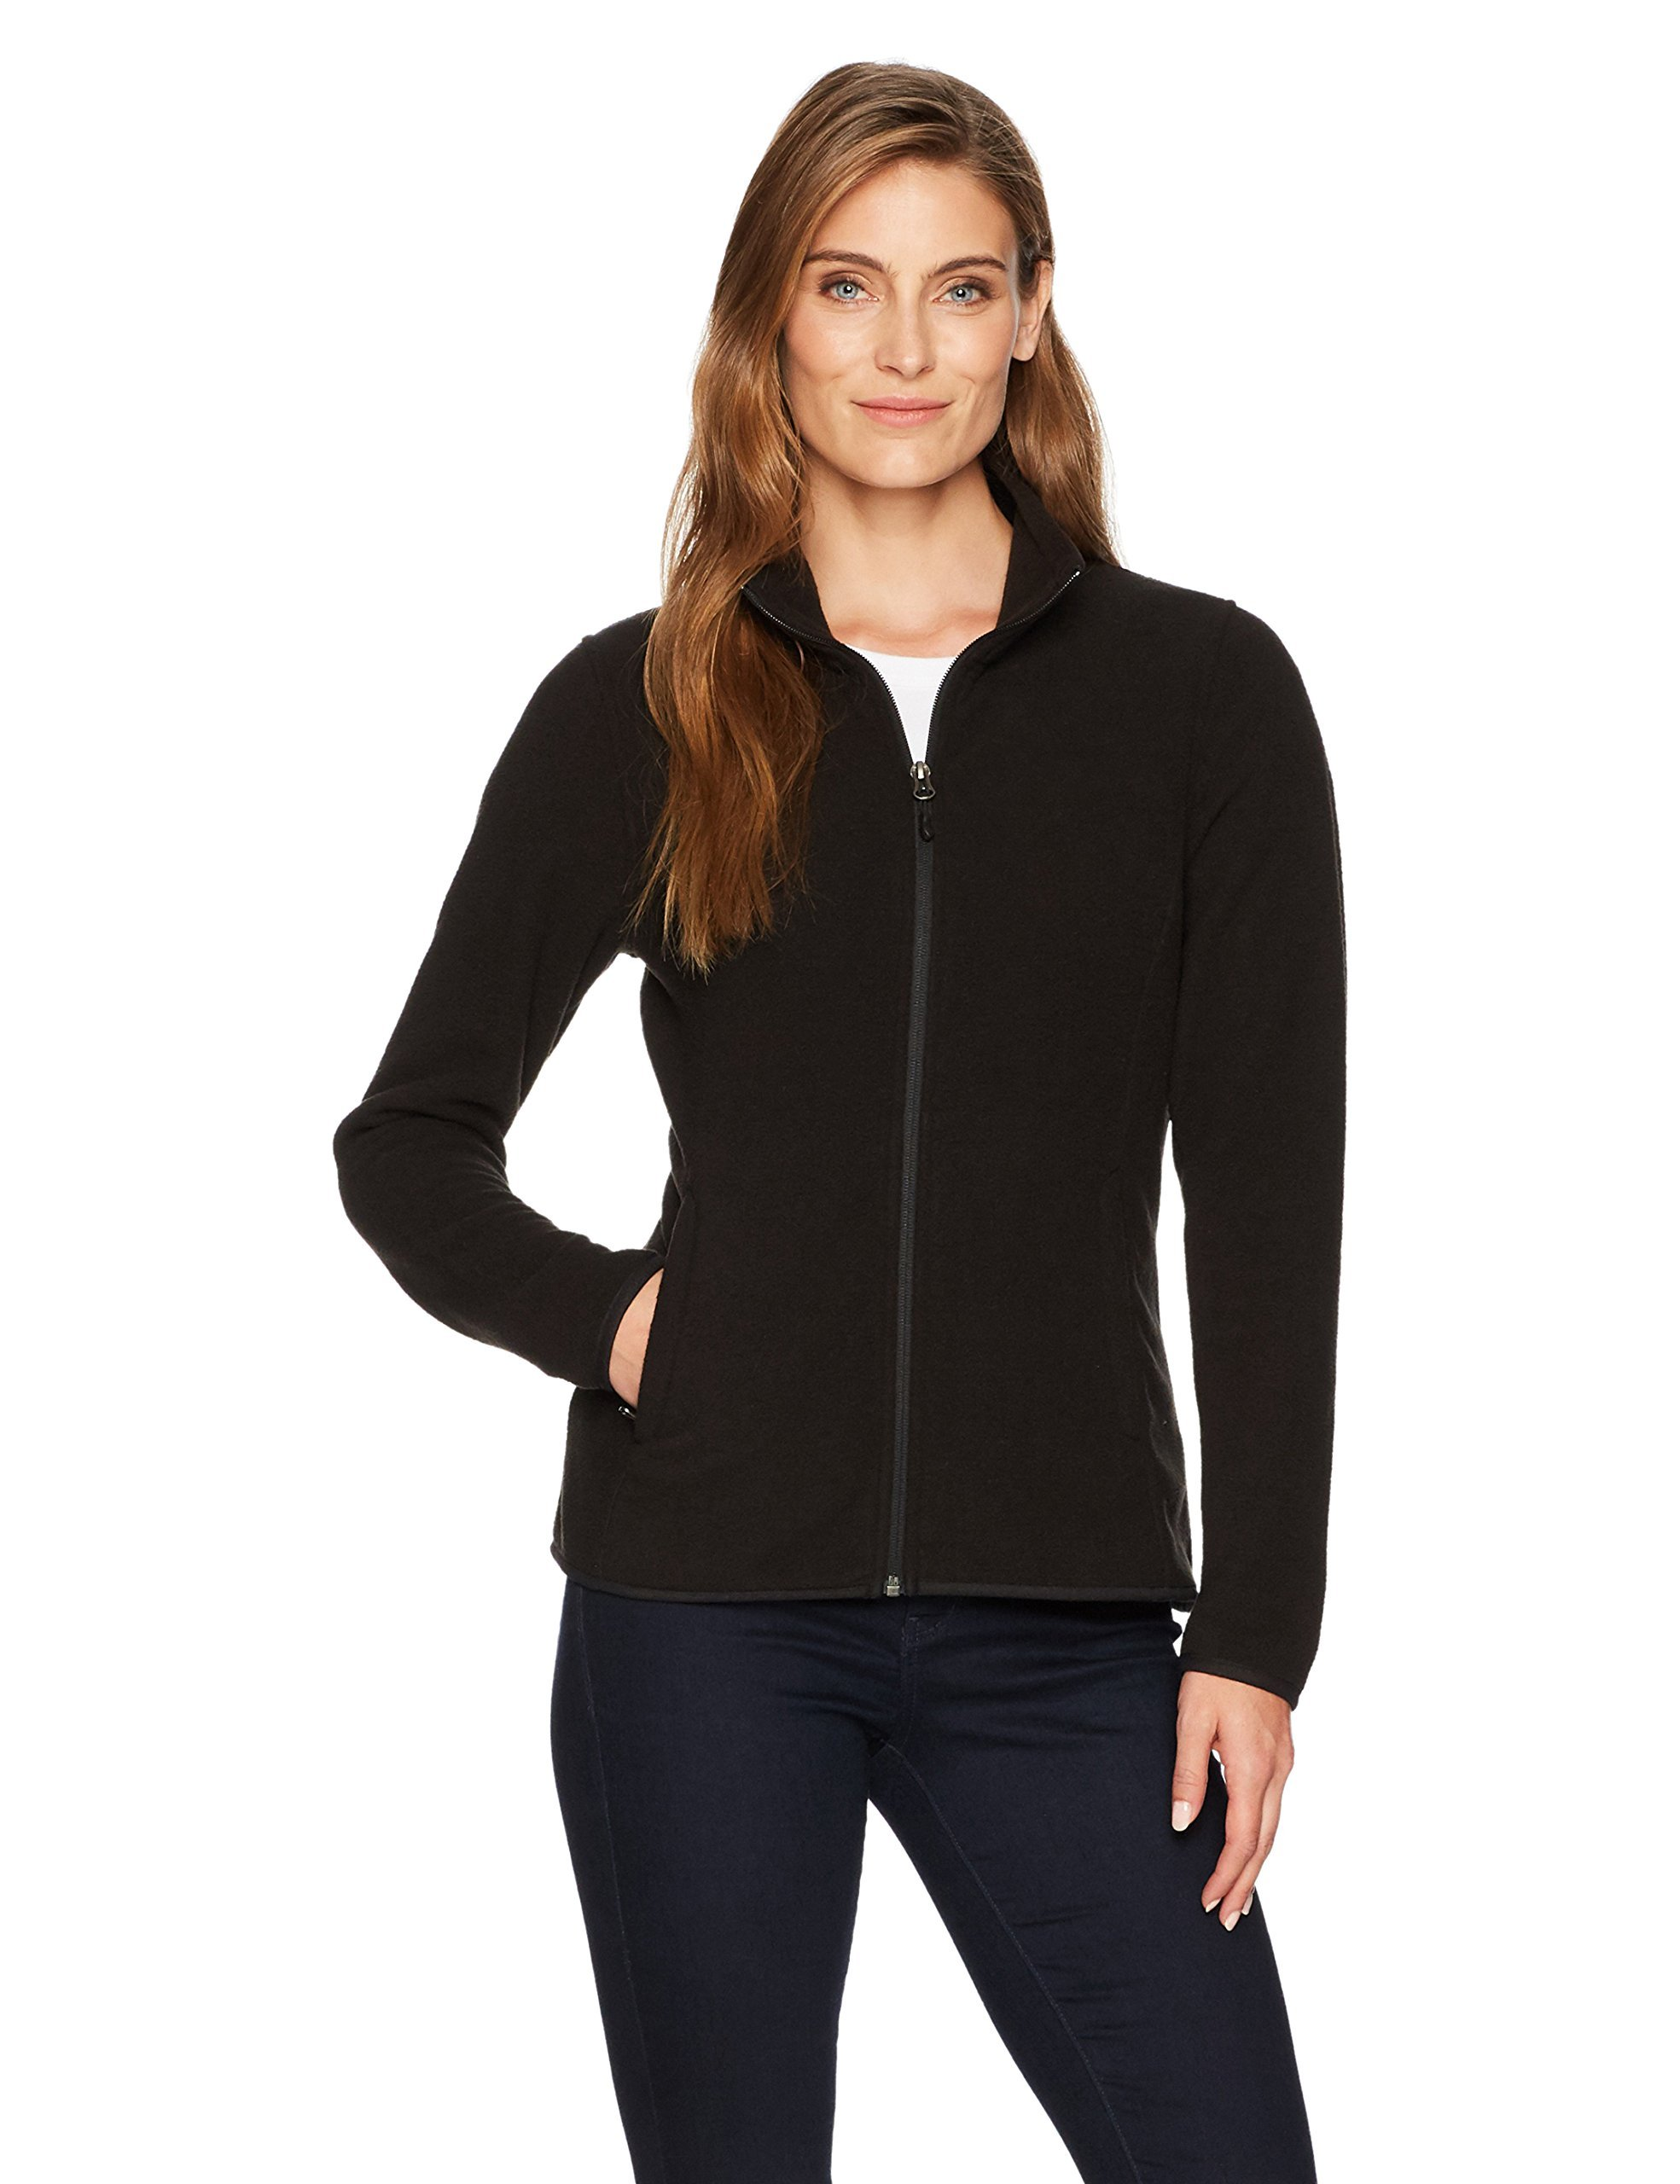 Amazon Essentials Womens Full-Zip Polar Fleece Jacket, Black, Medium